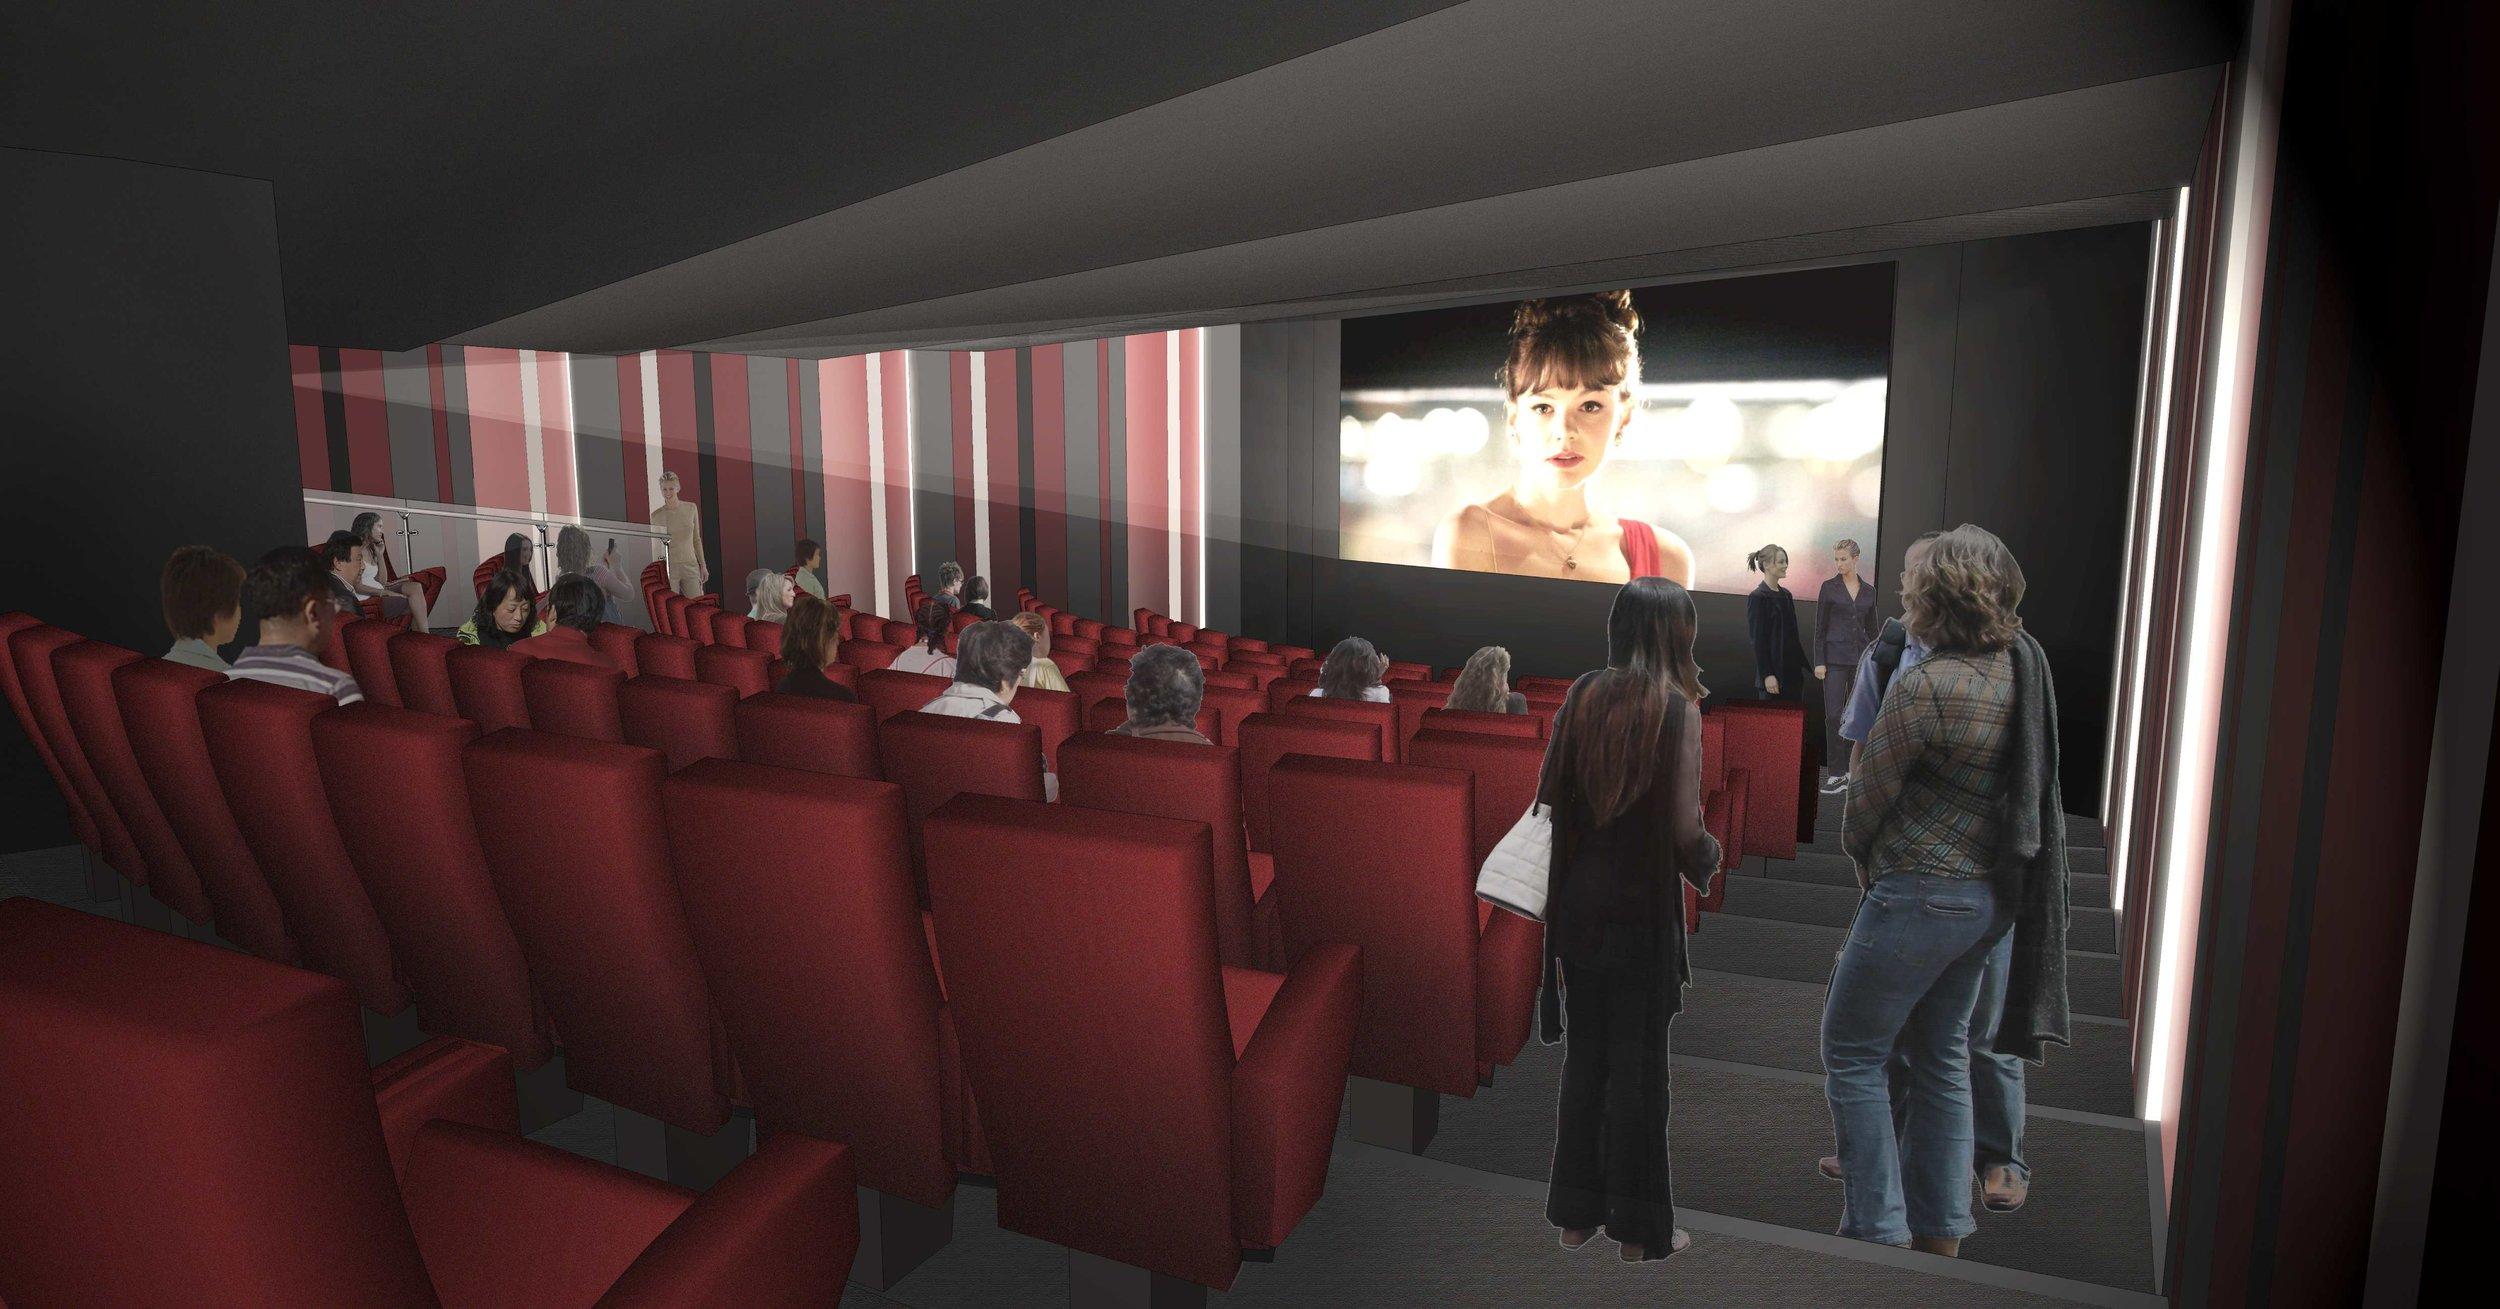 University of Limerick Cinema